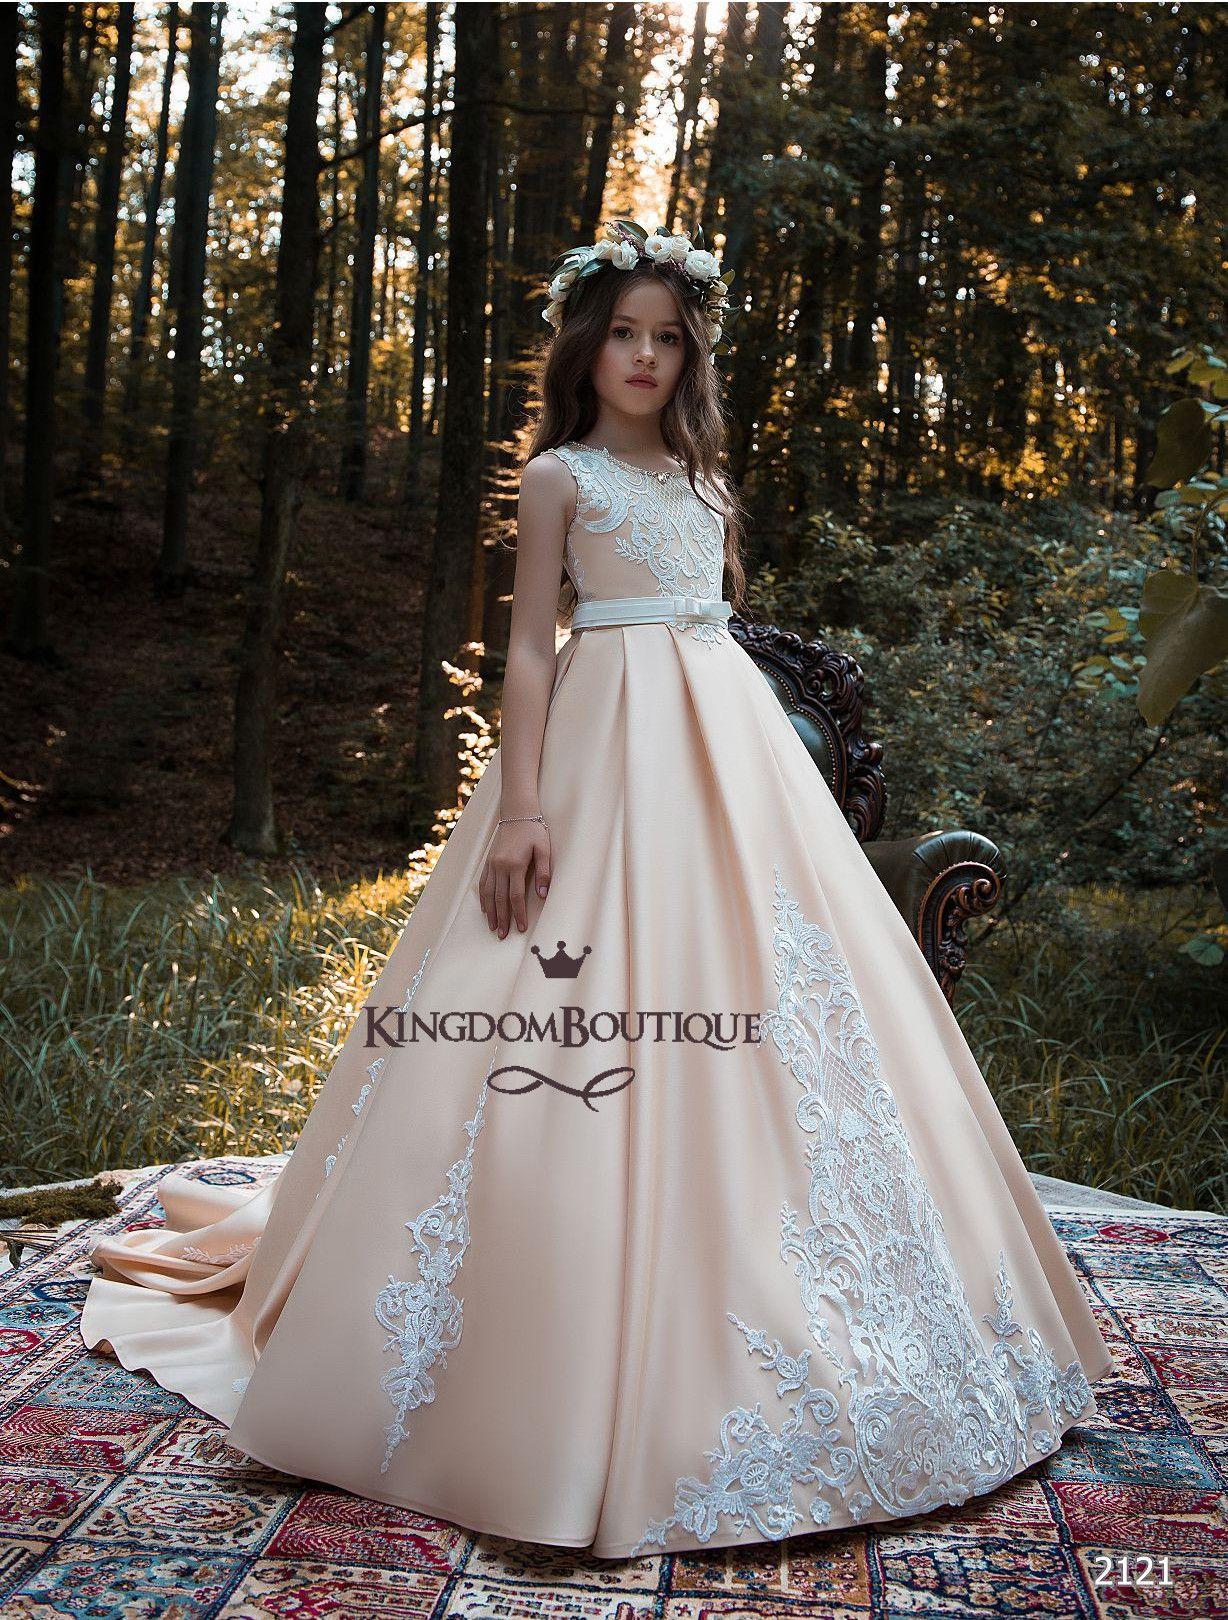 catalog pinterest enchanted queen dress and girls dresses